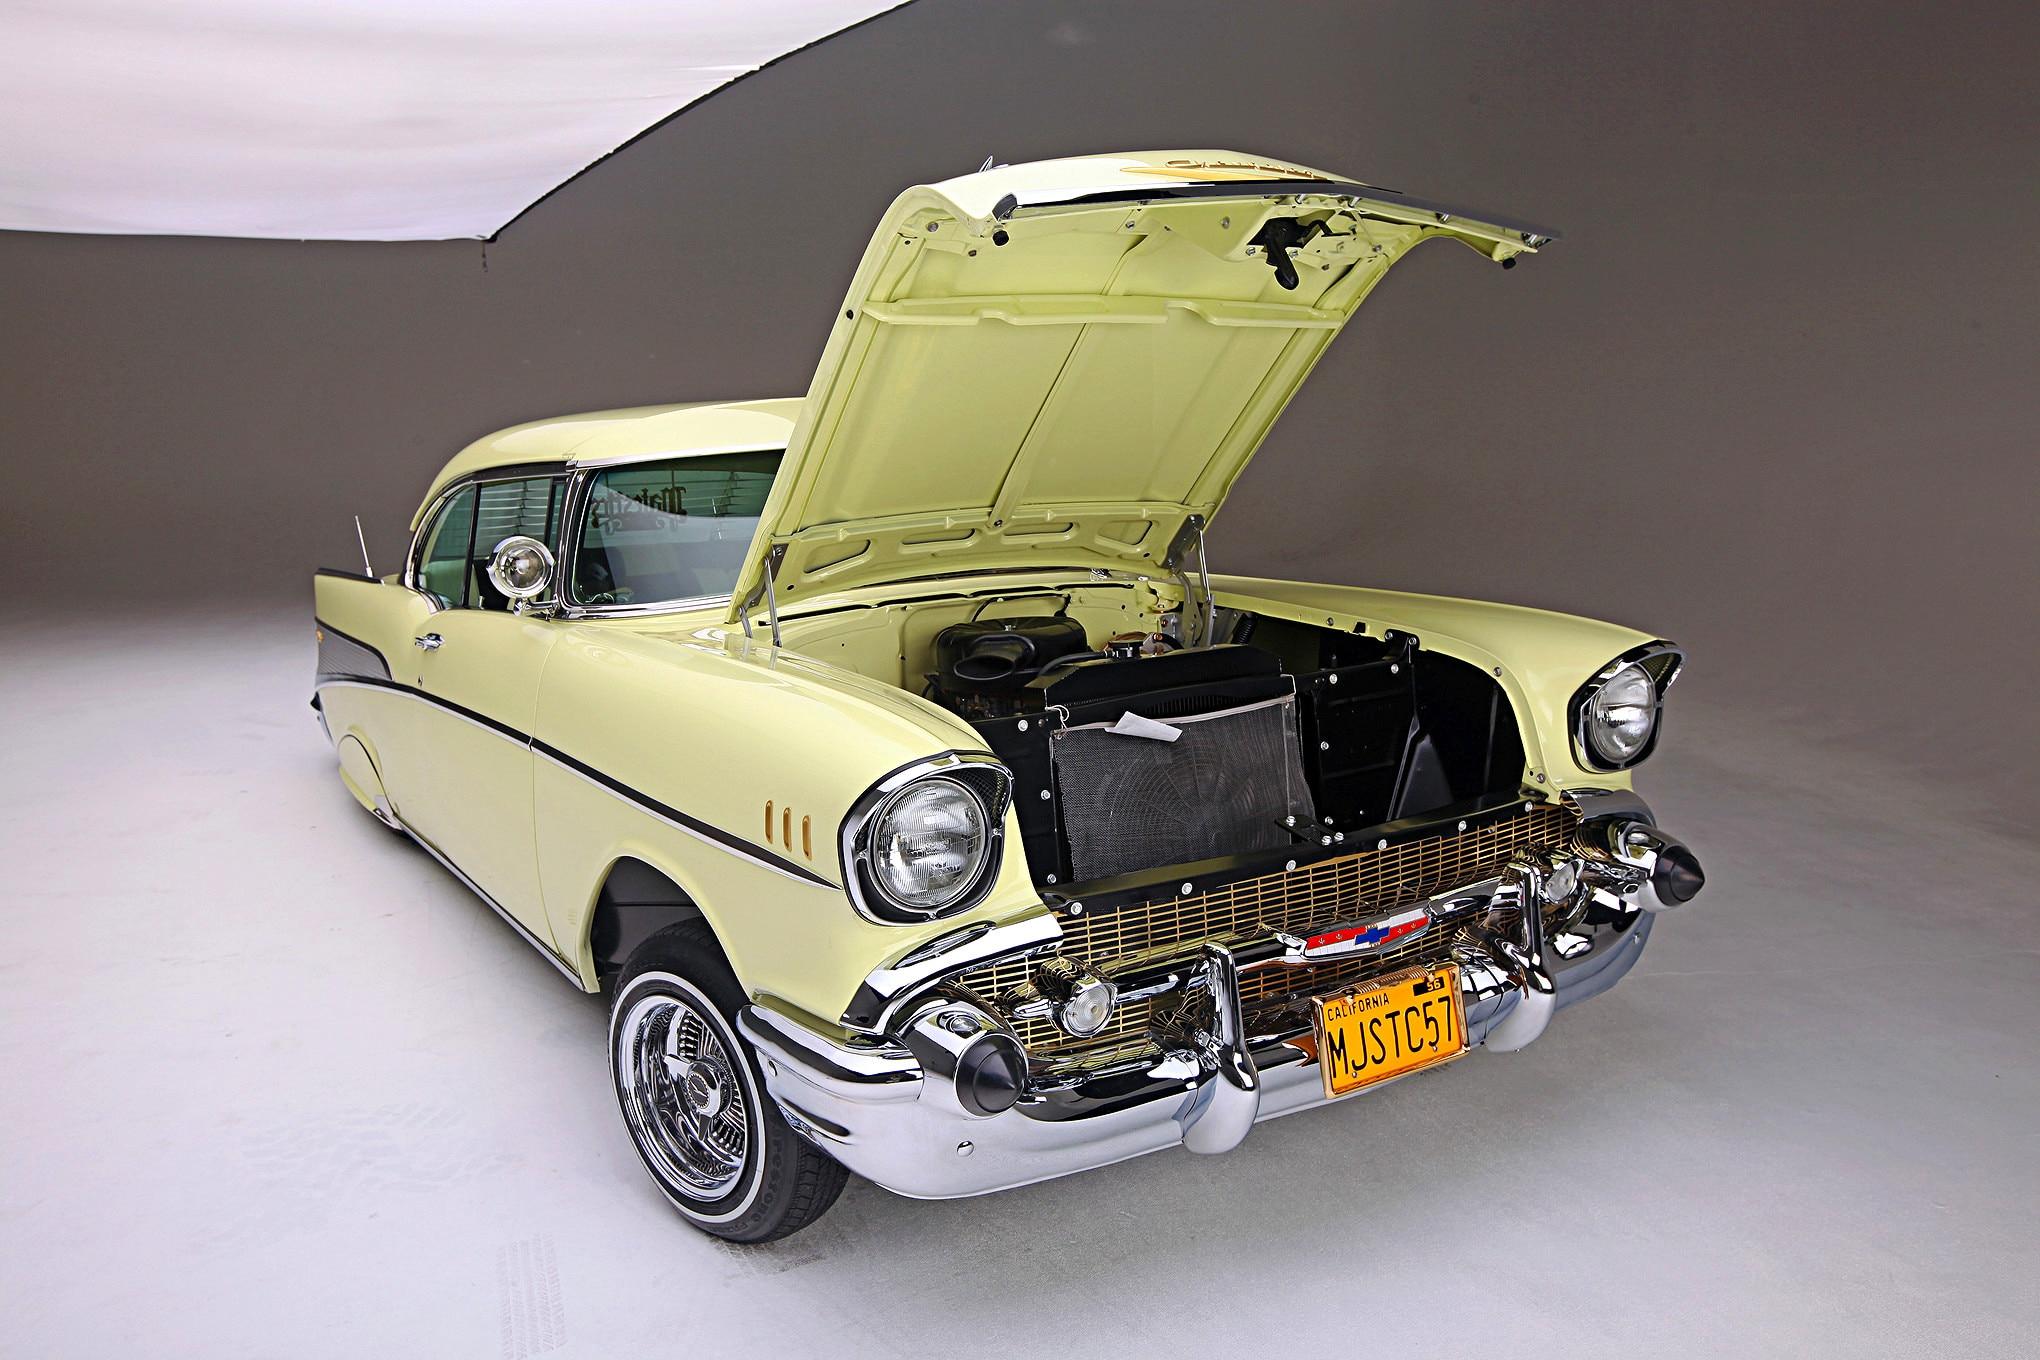 Fully Restored 1957 Chevrolet Bel Air